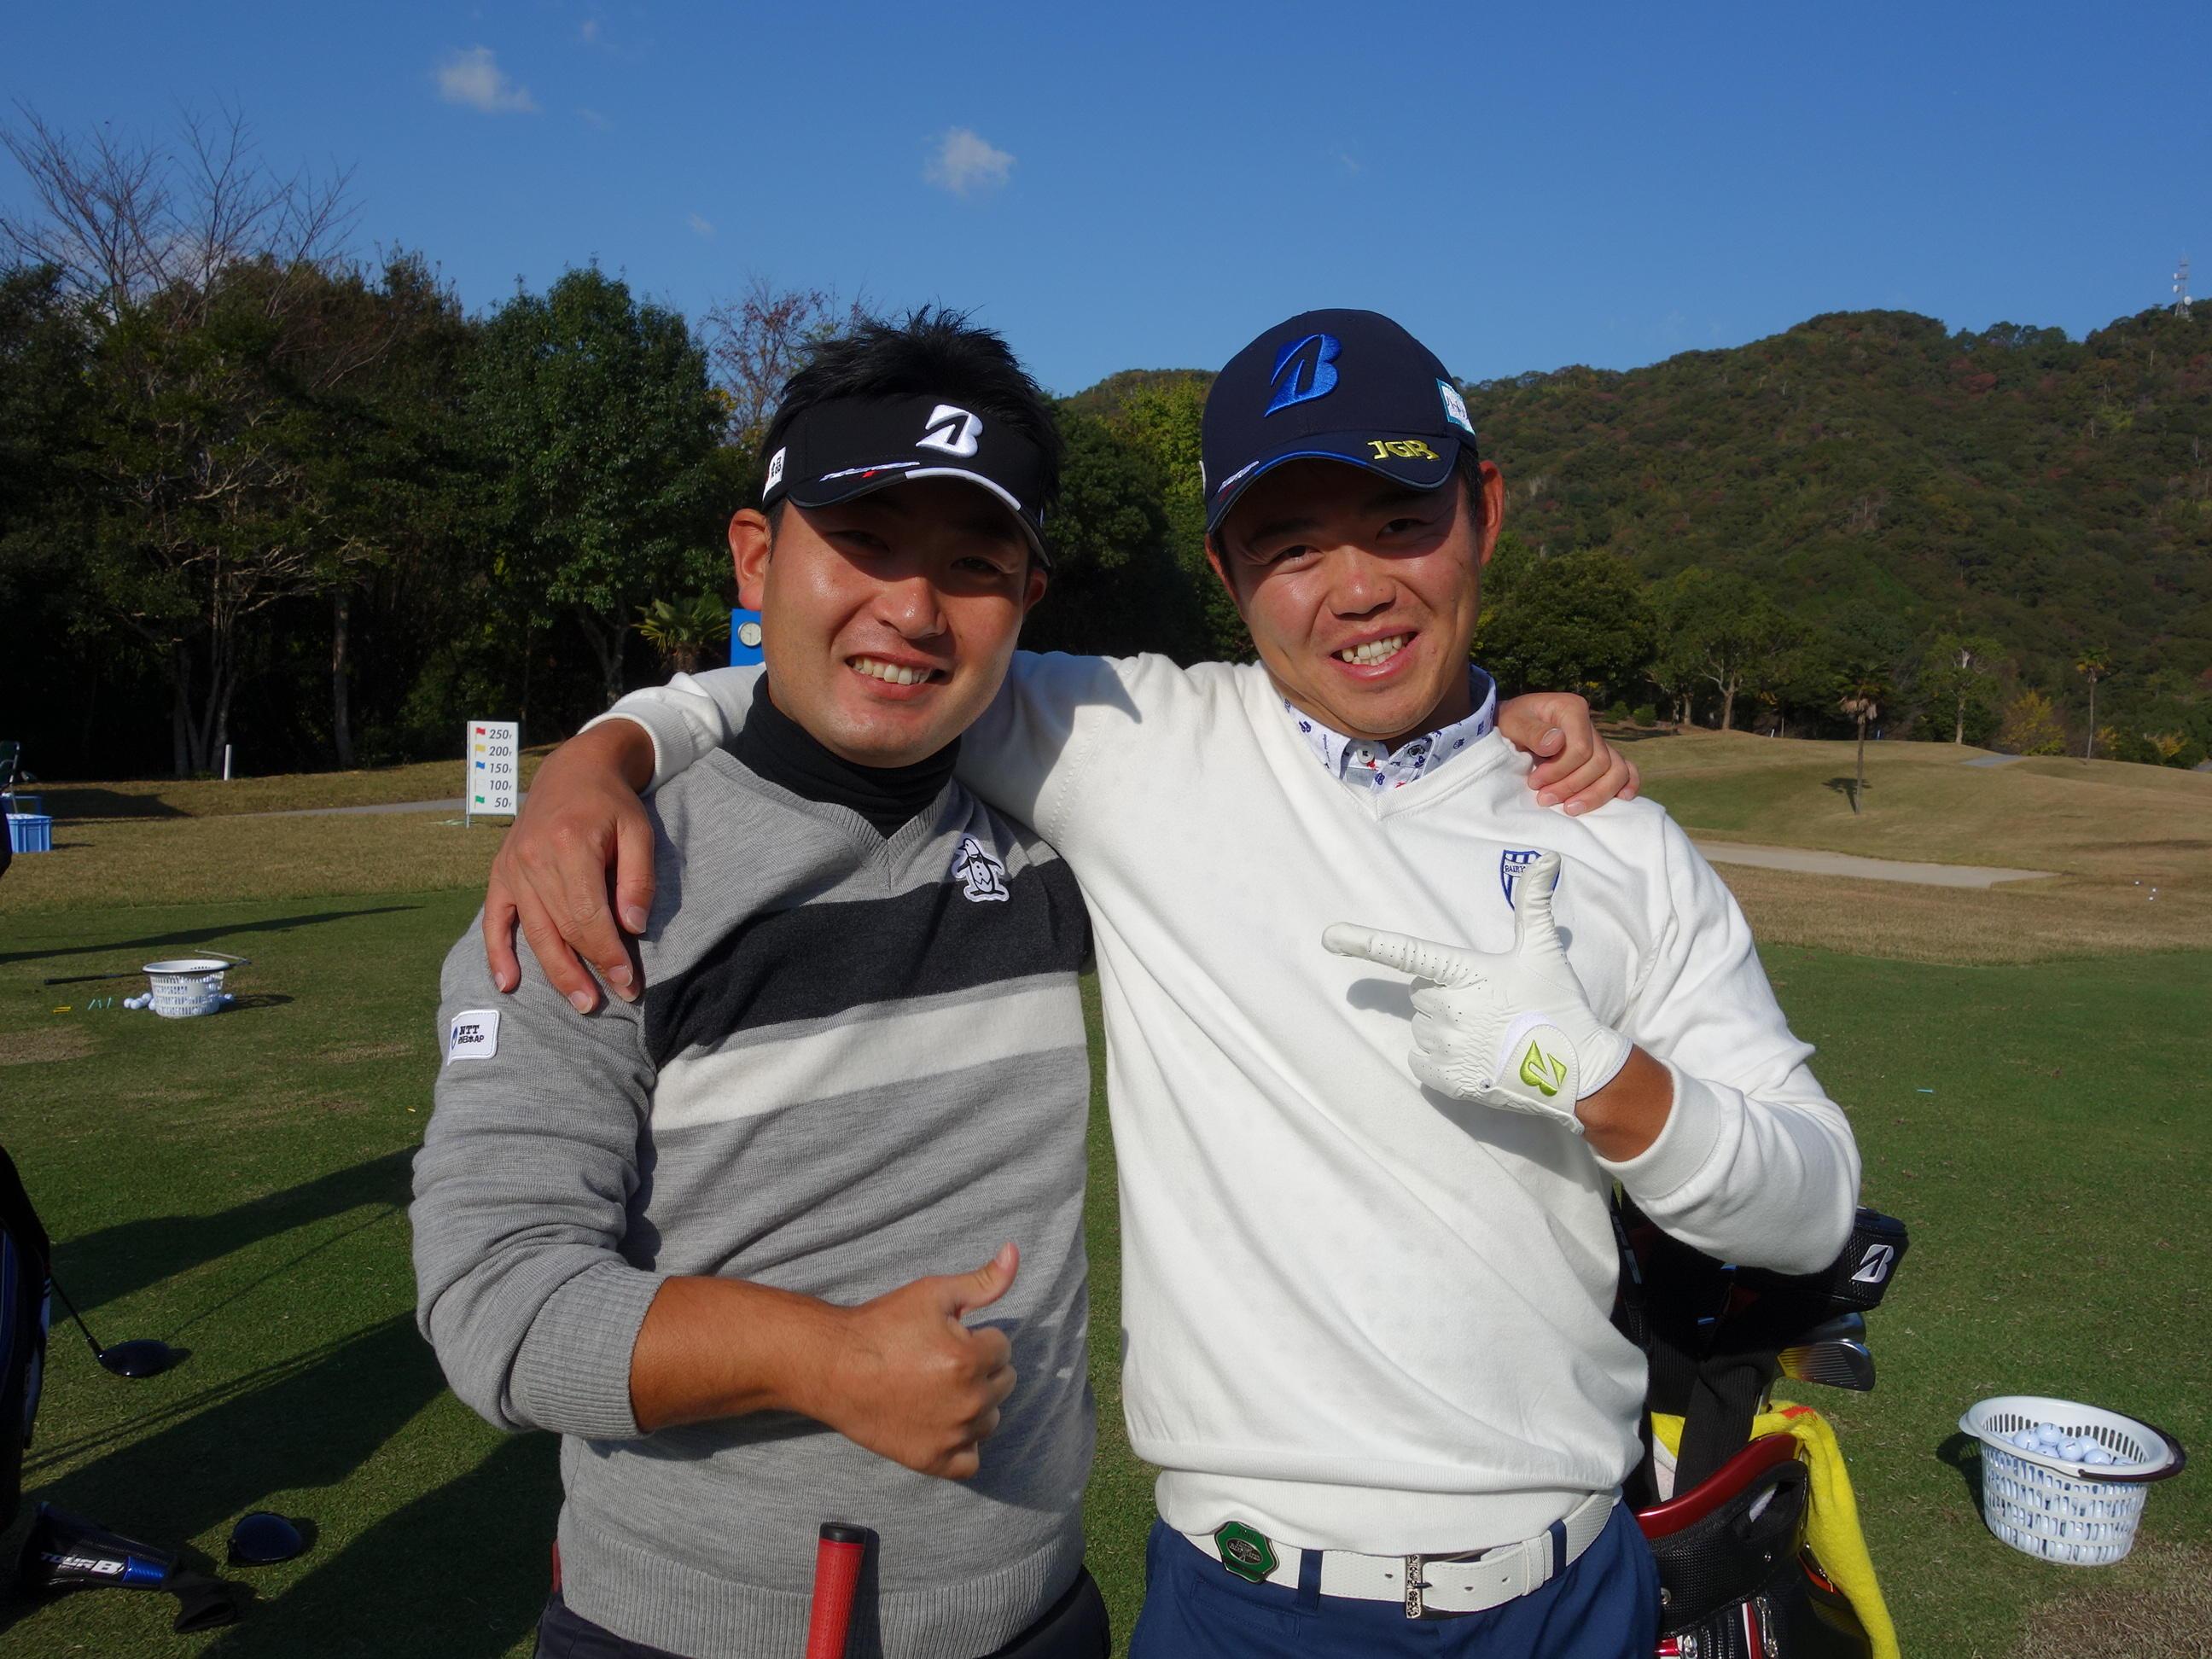 http://www.bs-golf.com/pro/ff72593425b0cbbf486500695589f93376e39a82.JPG